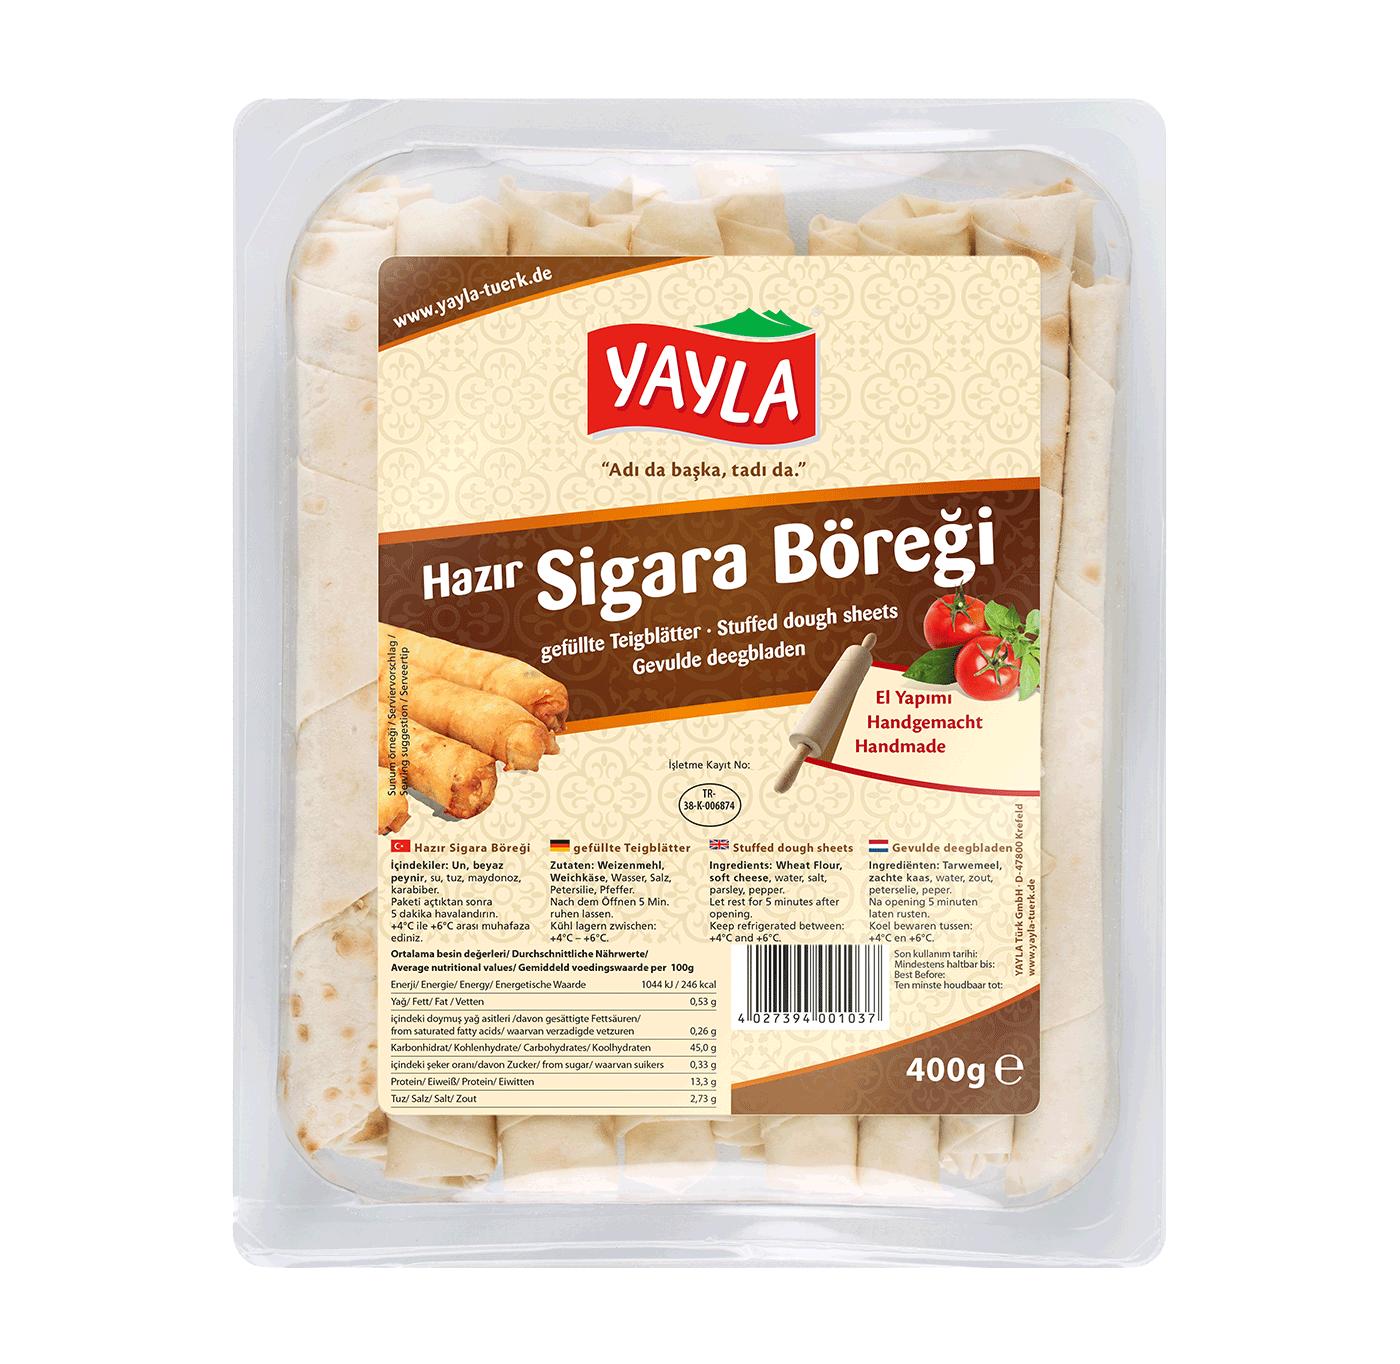 Yayla   Teigblätter mit Käse-Füllung